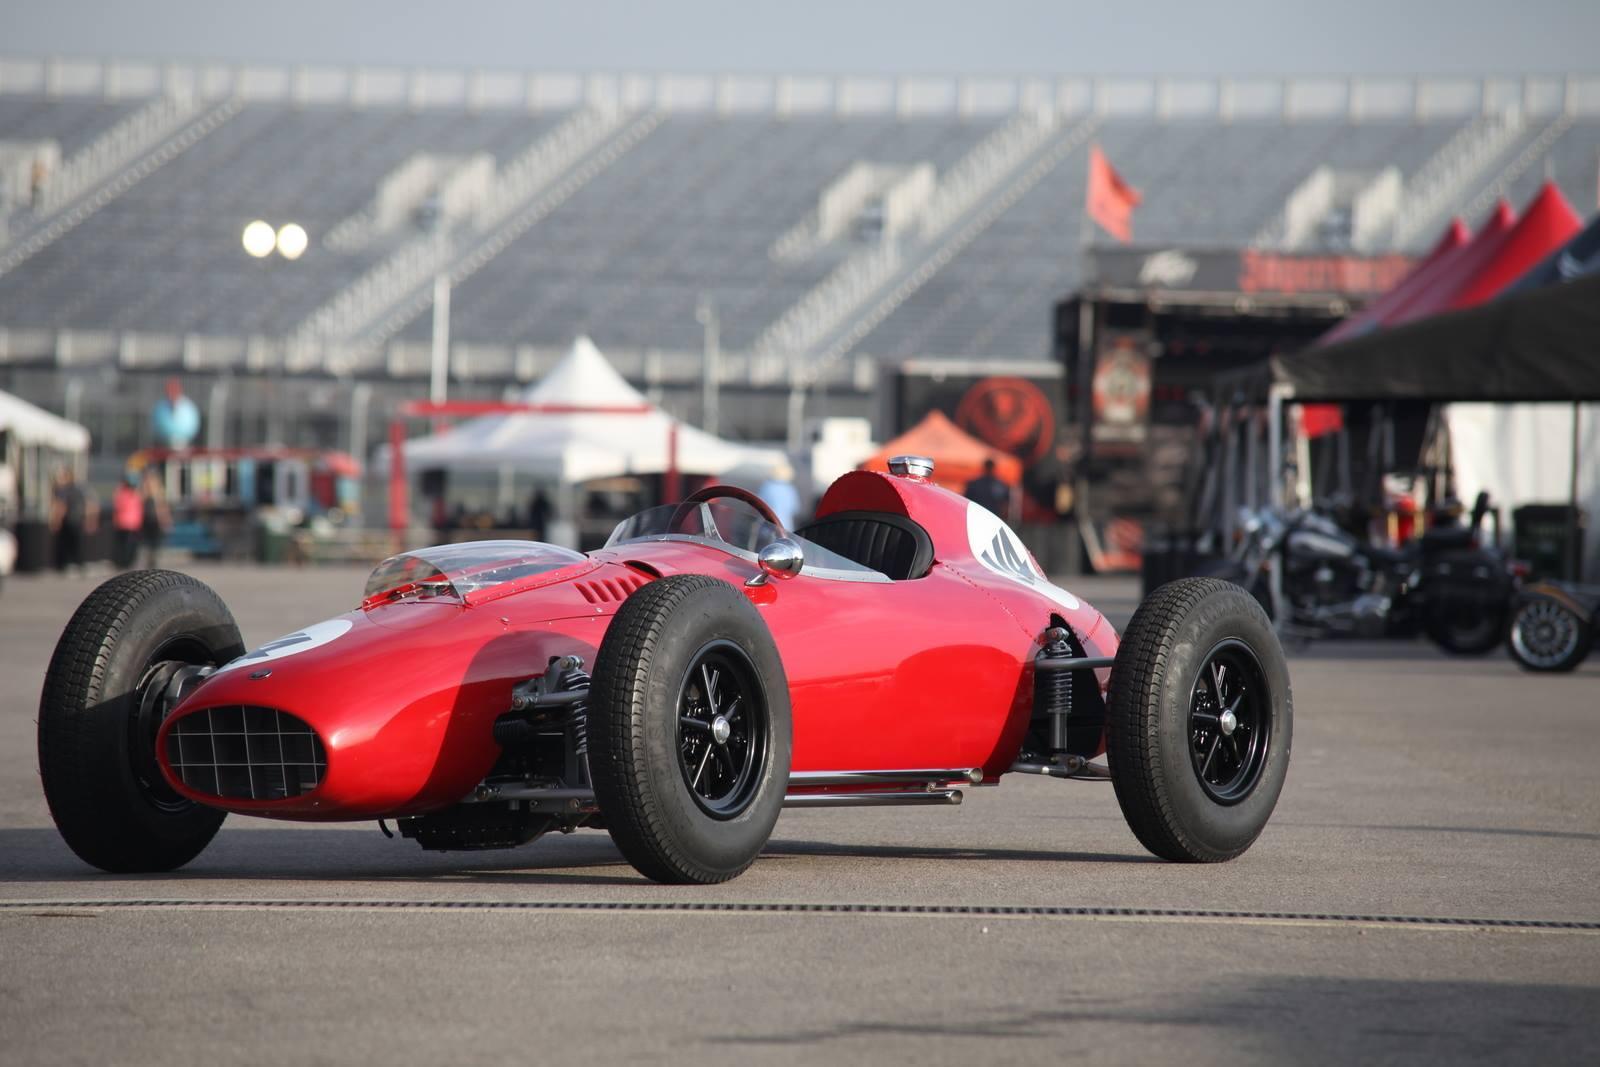 Rcr Monoposto Ferrari F Replica With A Motus V on V4 Crate Engine